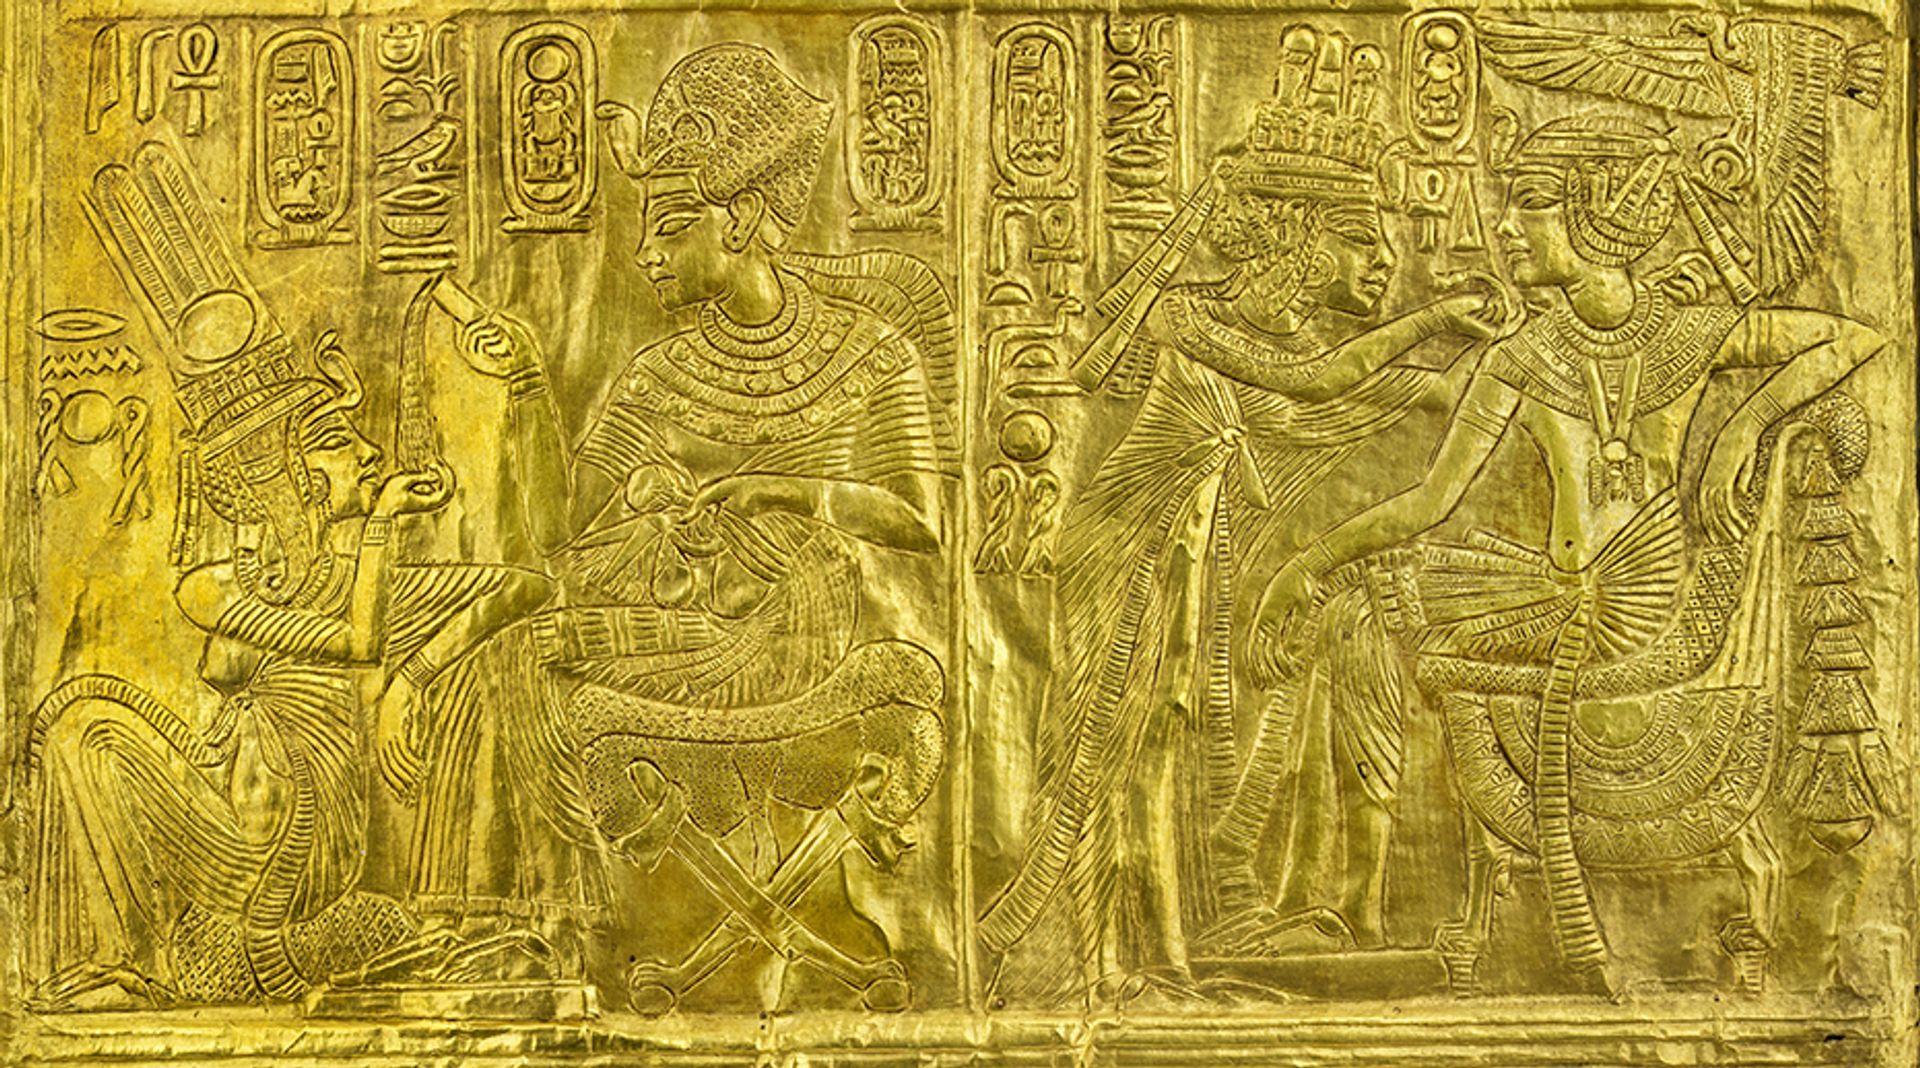 GIlded wooden shrine with scenes of Tutanhkhamun Ankhesenamun Laboratoriorosso Viterbo Italy